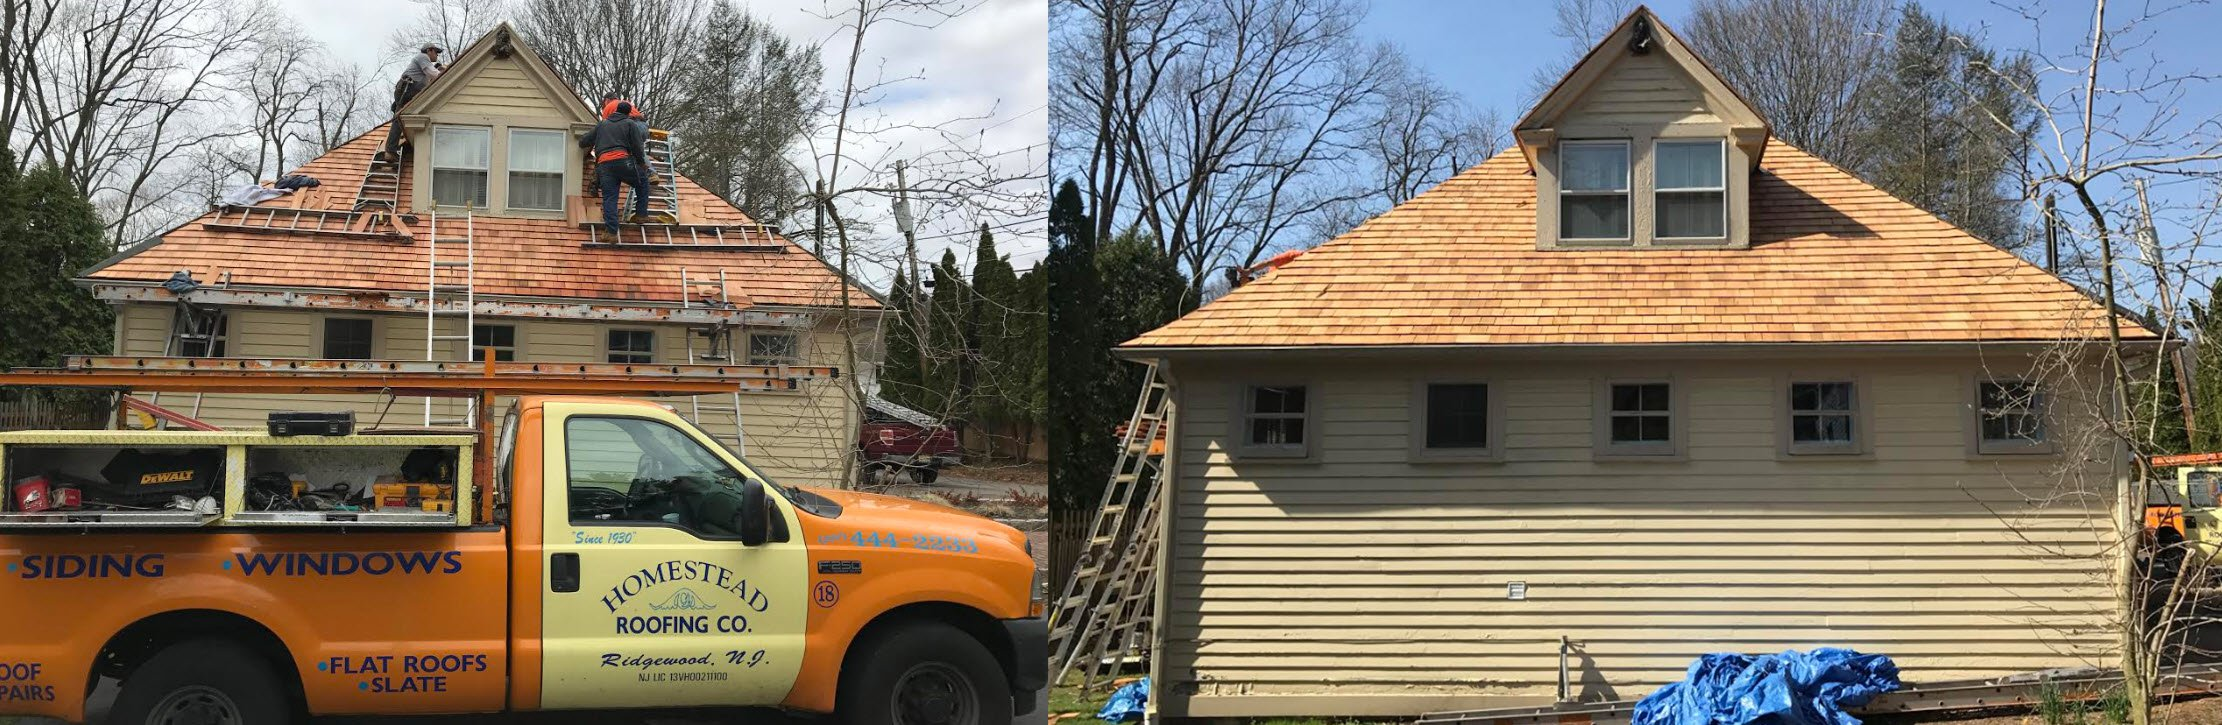 Roof Shingles Ridgewood Homestead Roofing Co